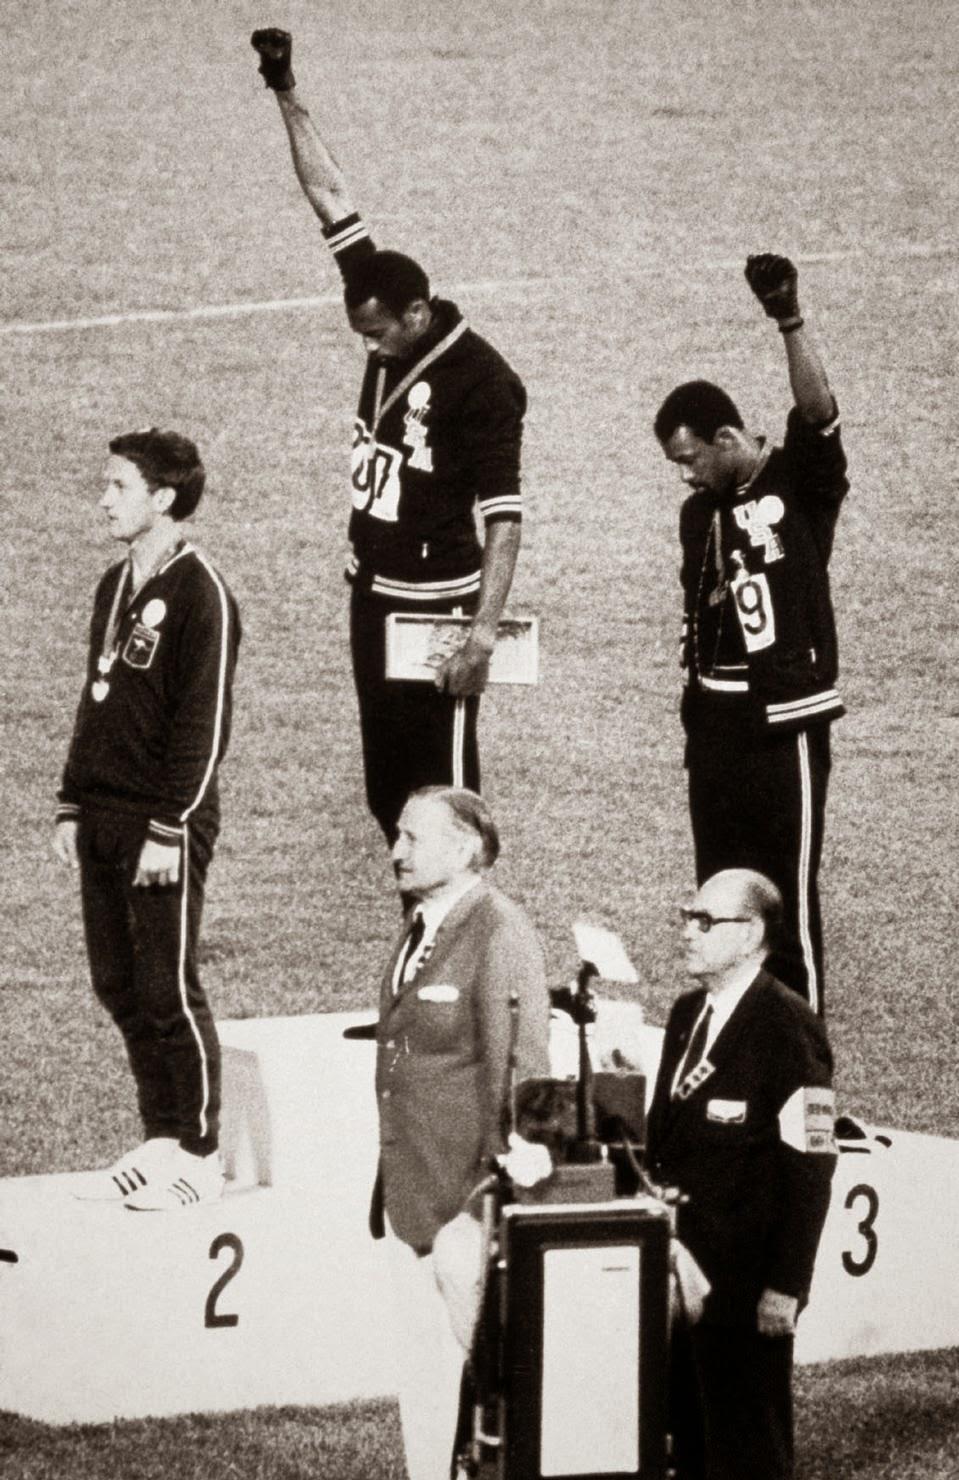 Smith Carlos 1968 Olimpiadi Pantere Nere Numeri ordinali francesi nombres ordinaux